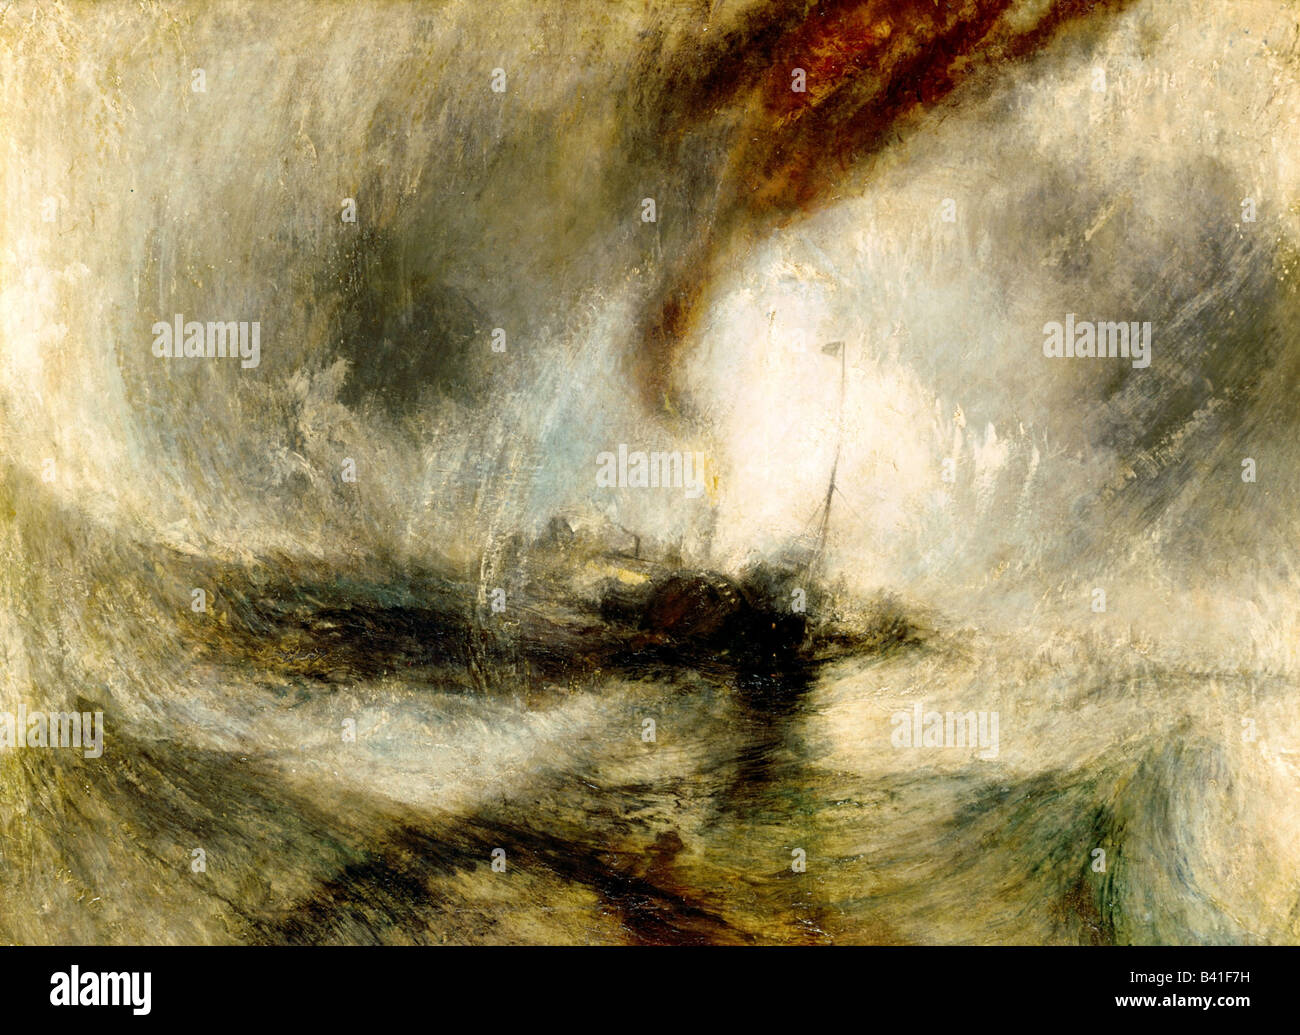 Bellas artes, Turner, Joseph Mallord William (1775 - 1851), la pintura 'tormenta', 1842, óleo sobre lienzo, Tate Foto de stock